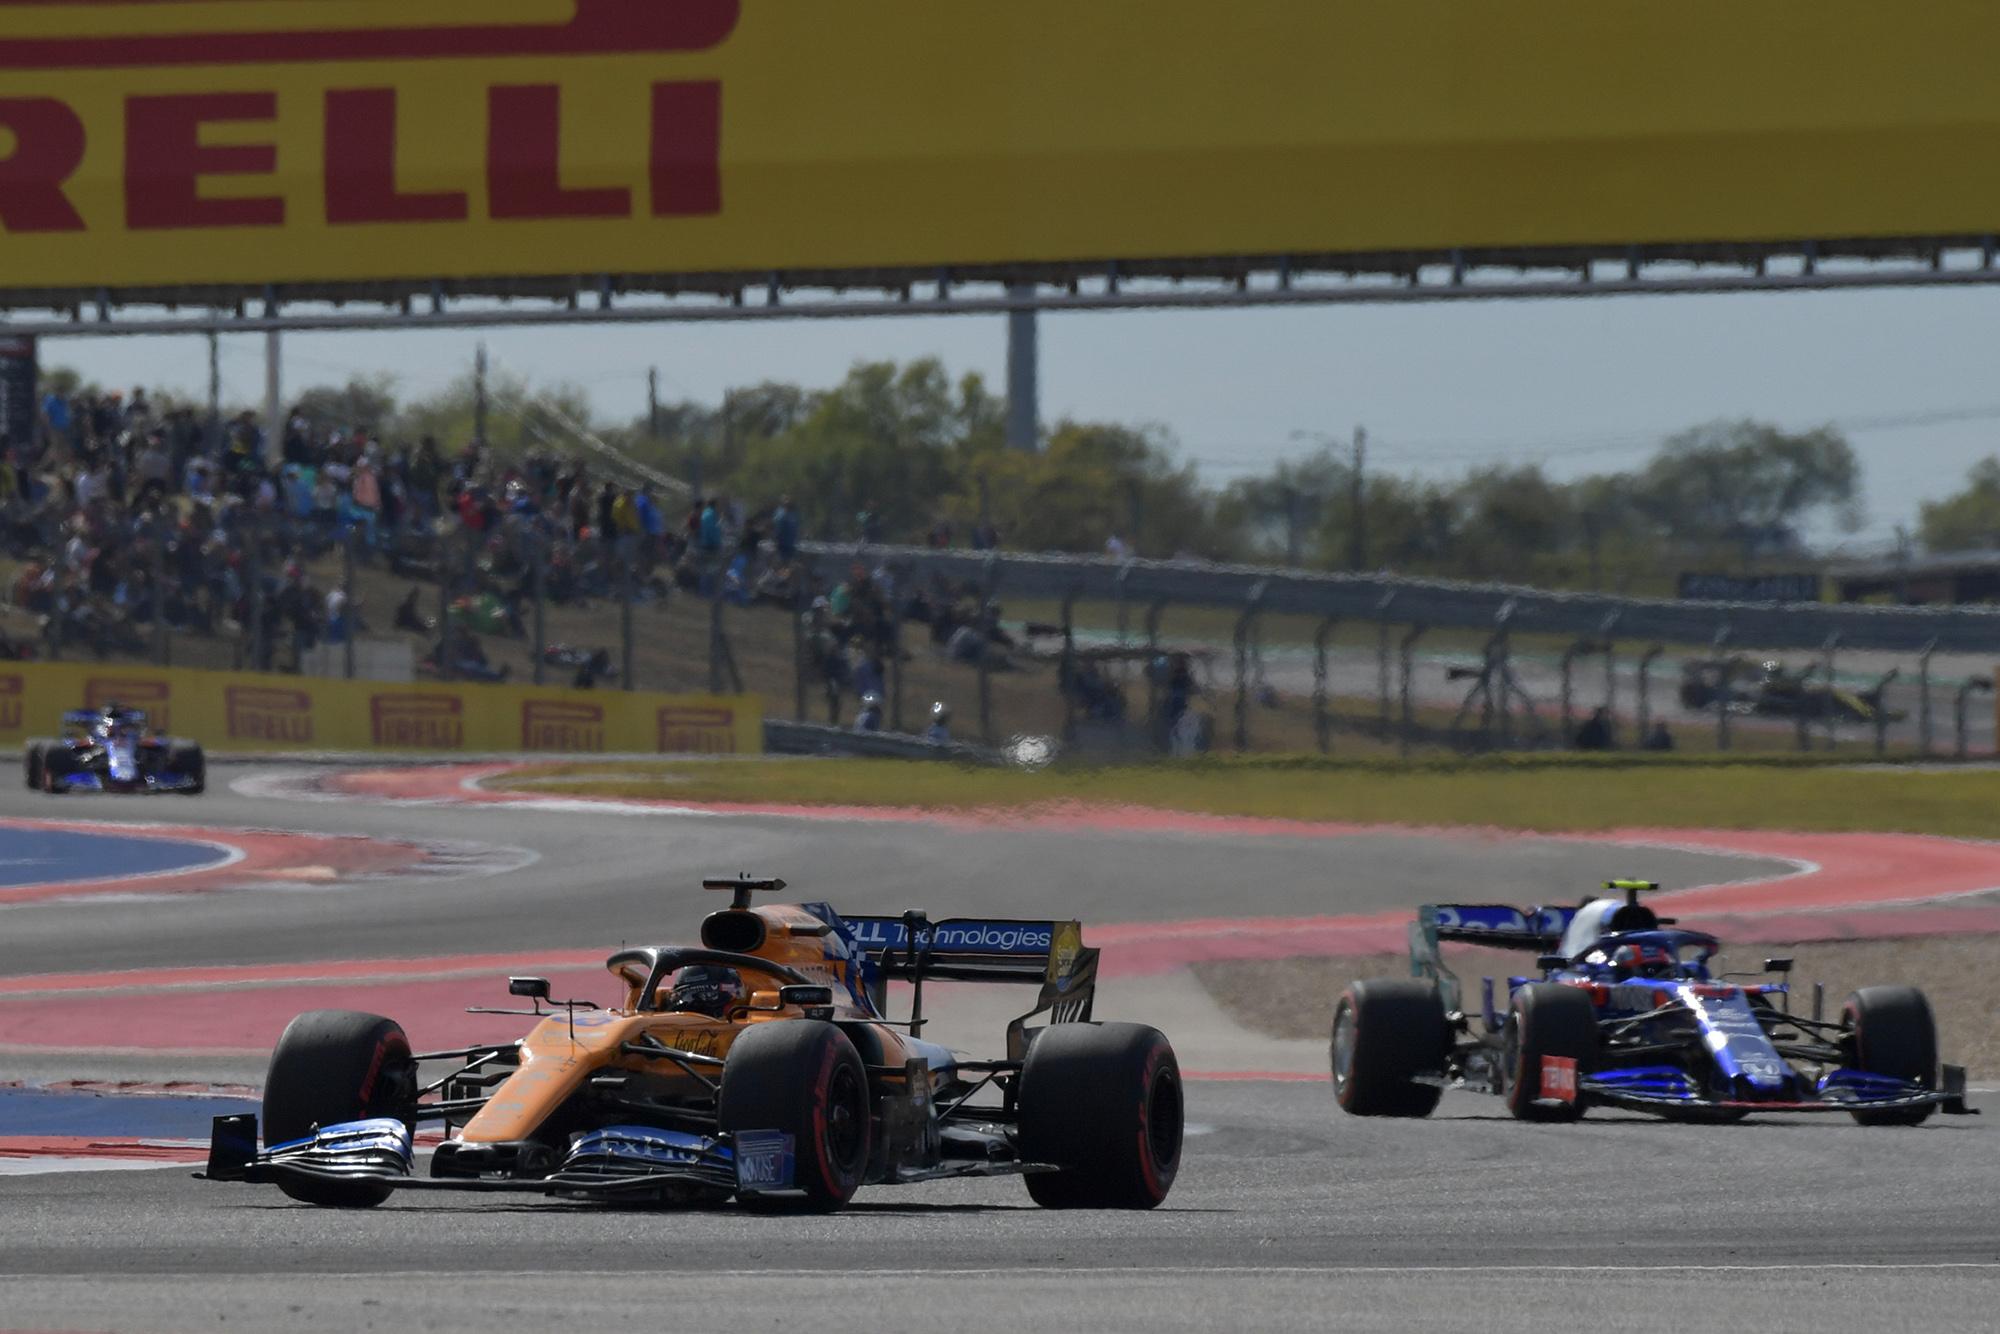 Carlos Sainz ahead of Daniil Kvyat during qualifying for the 2019 US Grand Prix